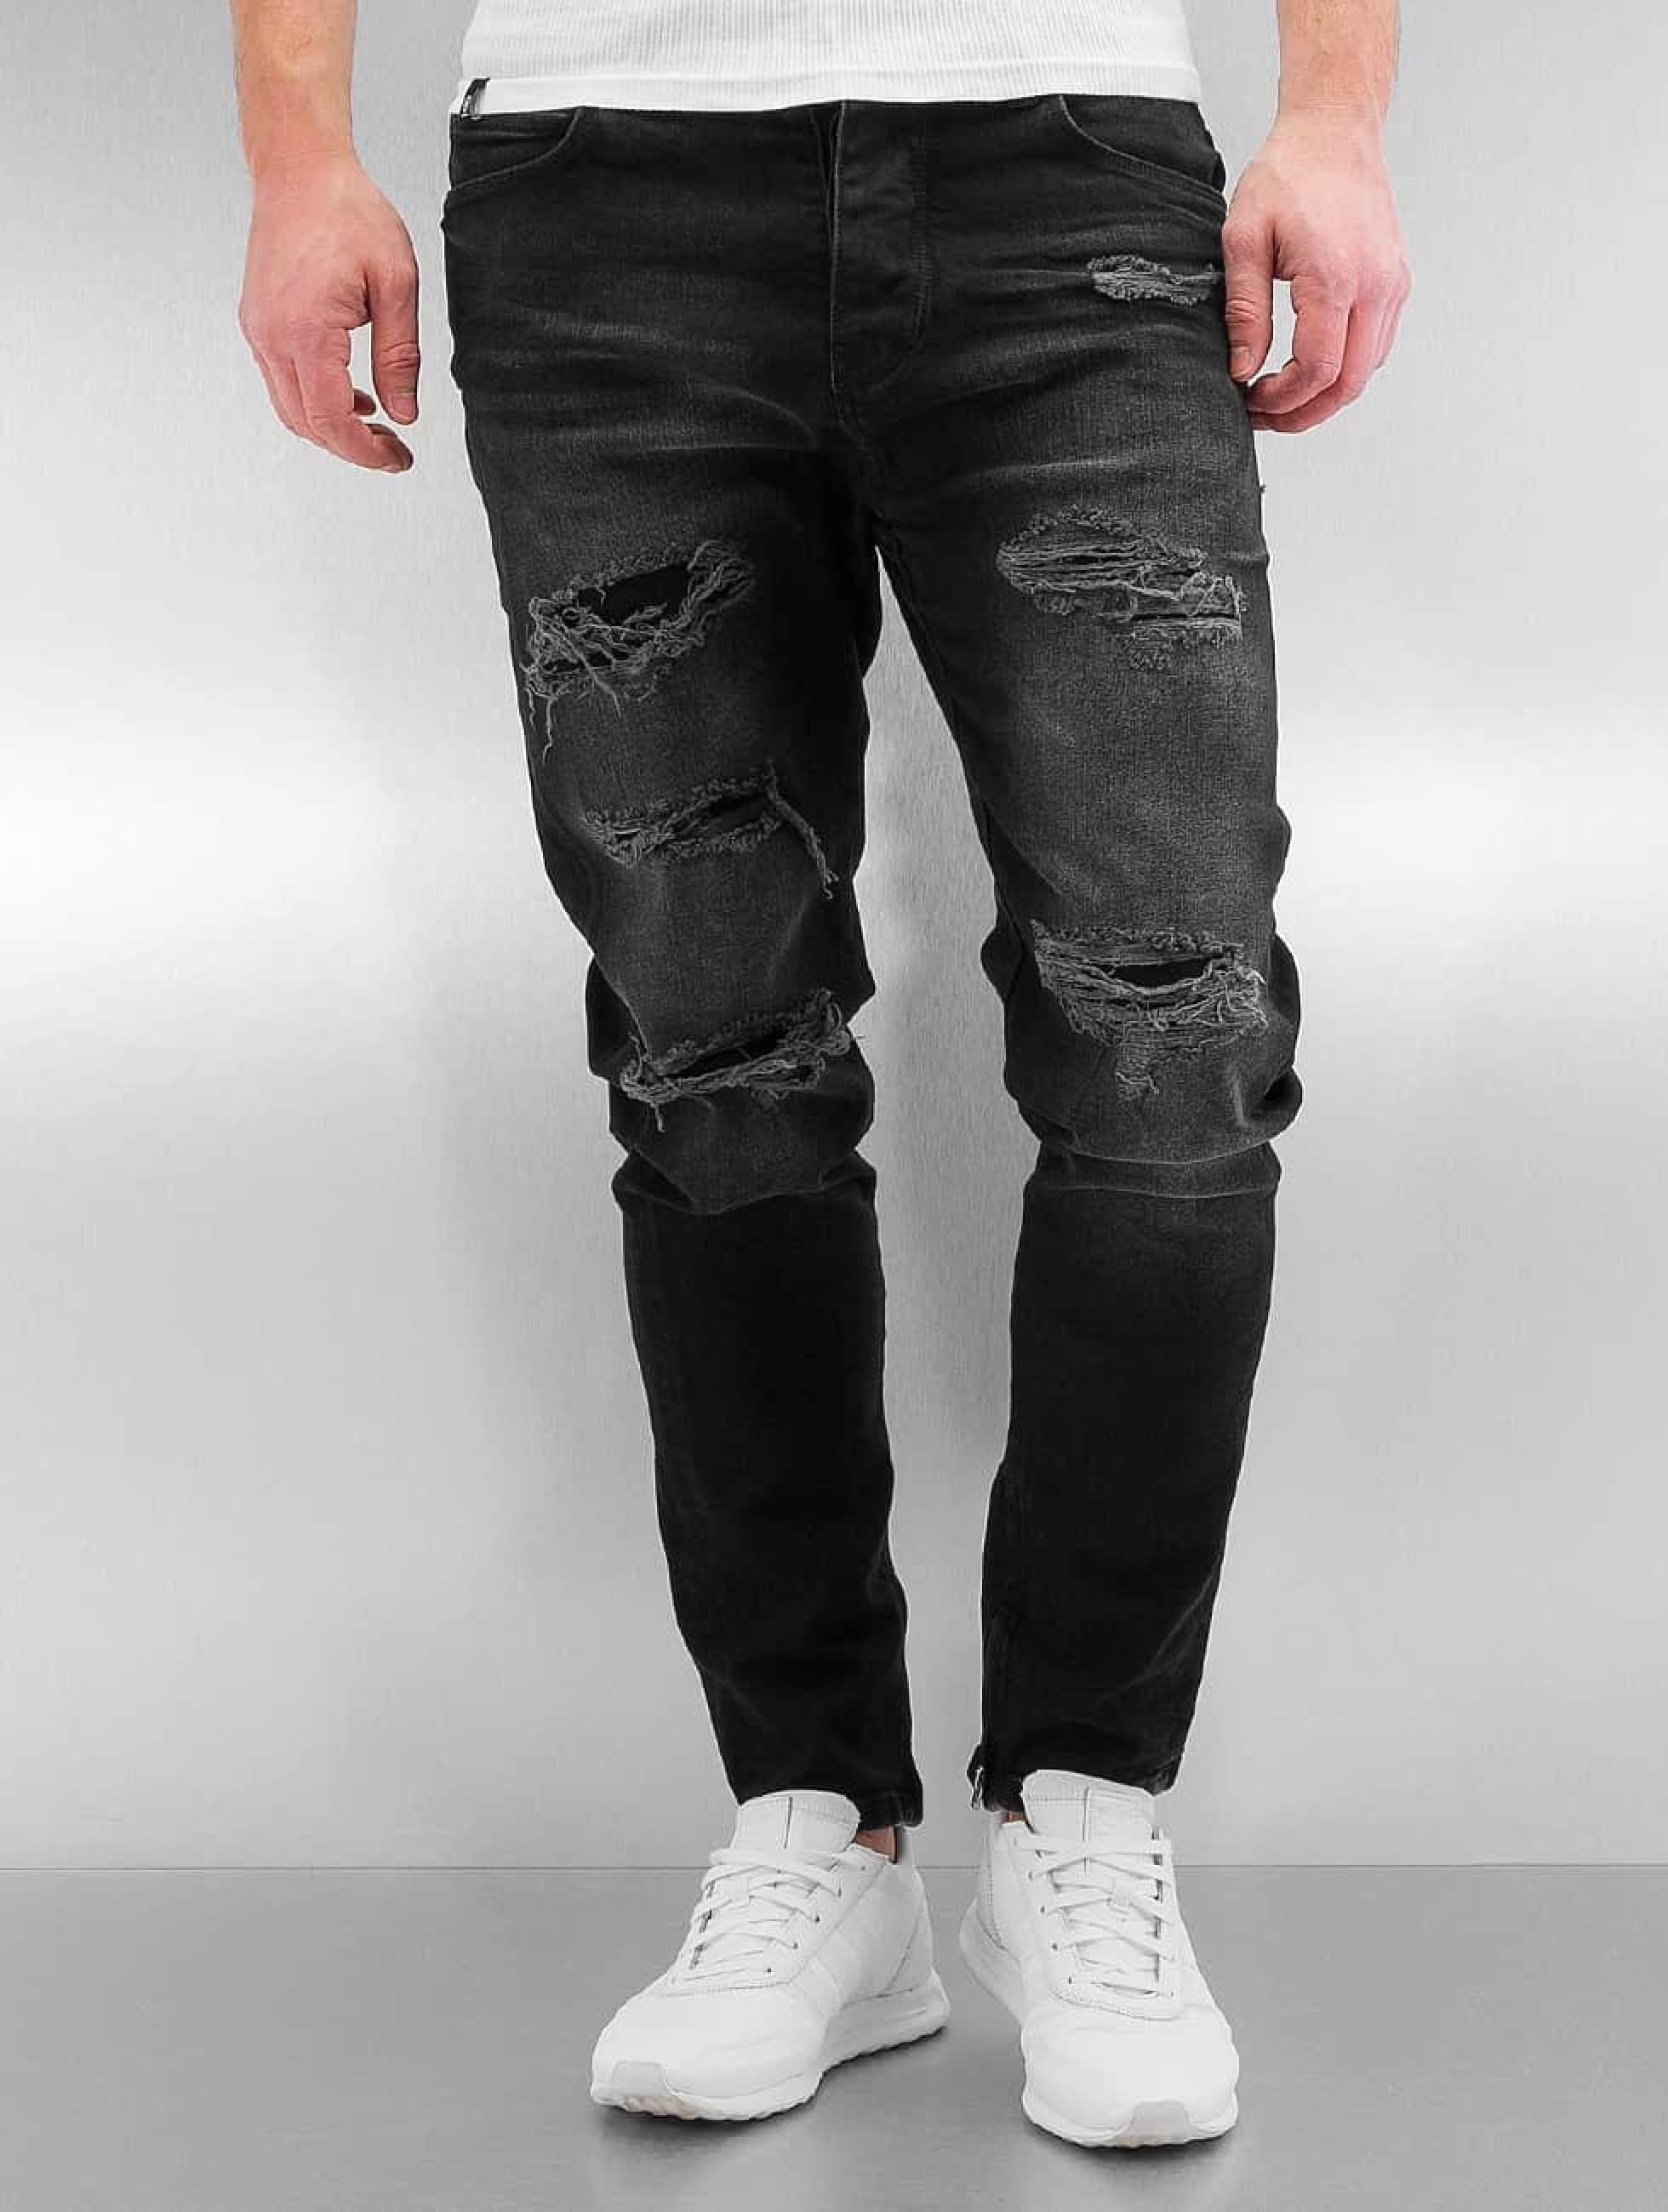 Bangastic / Slim Fit Jeans K125 in black W 32